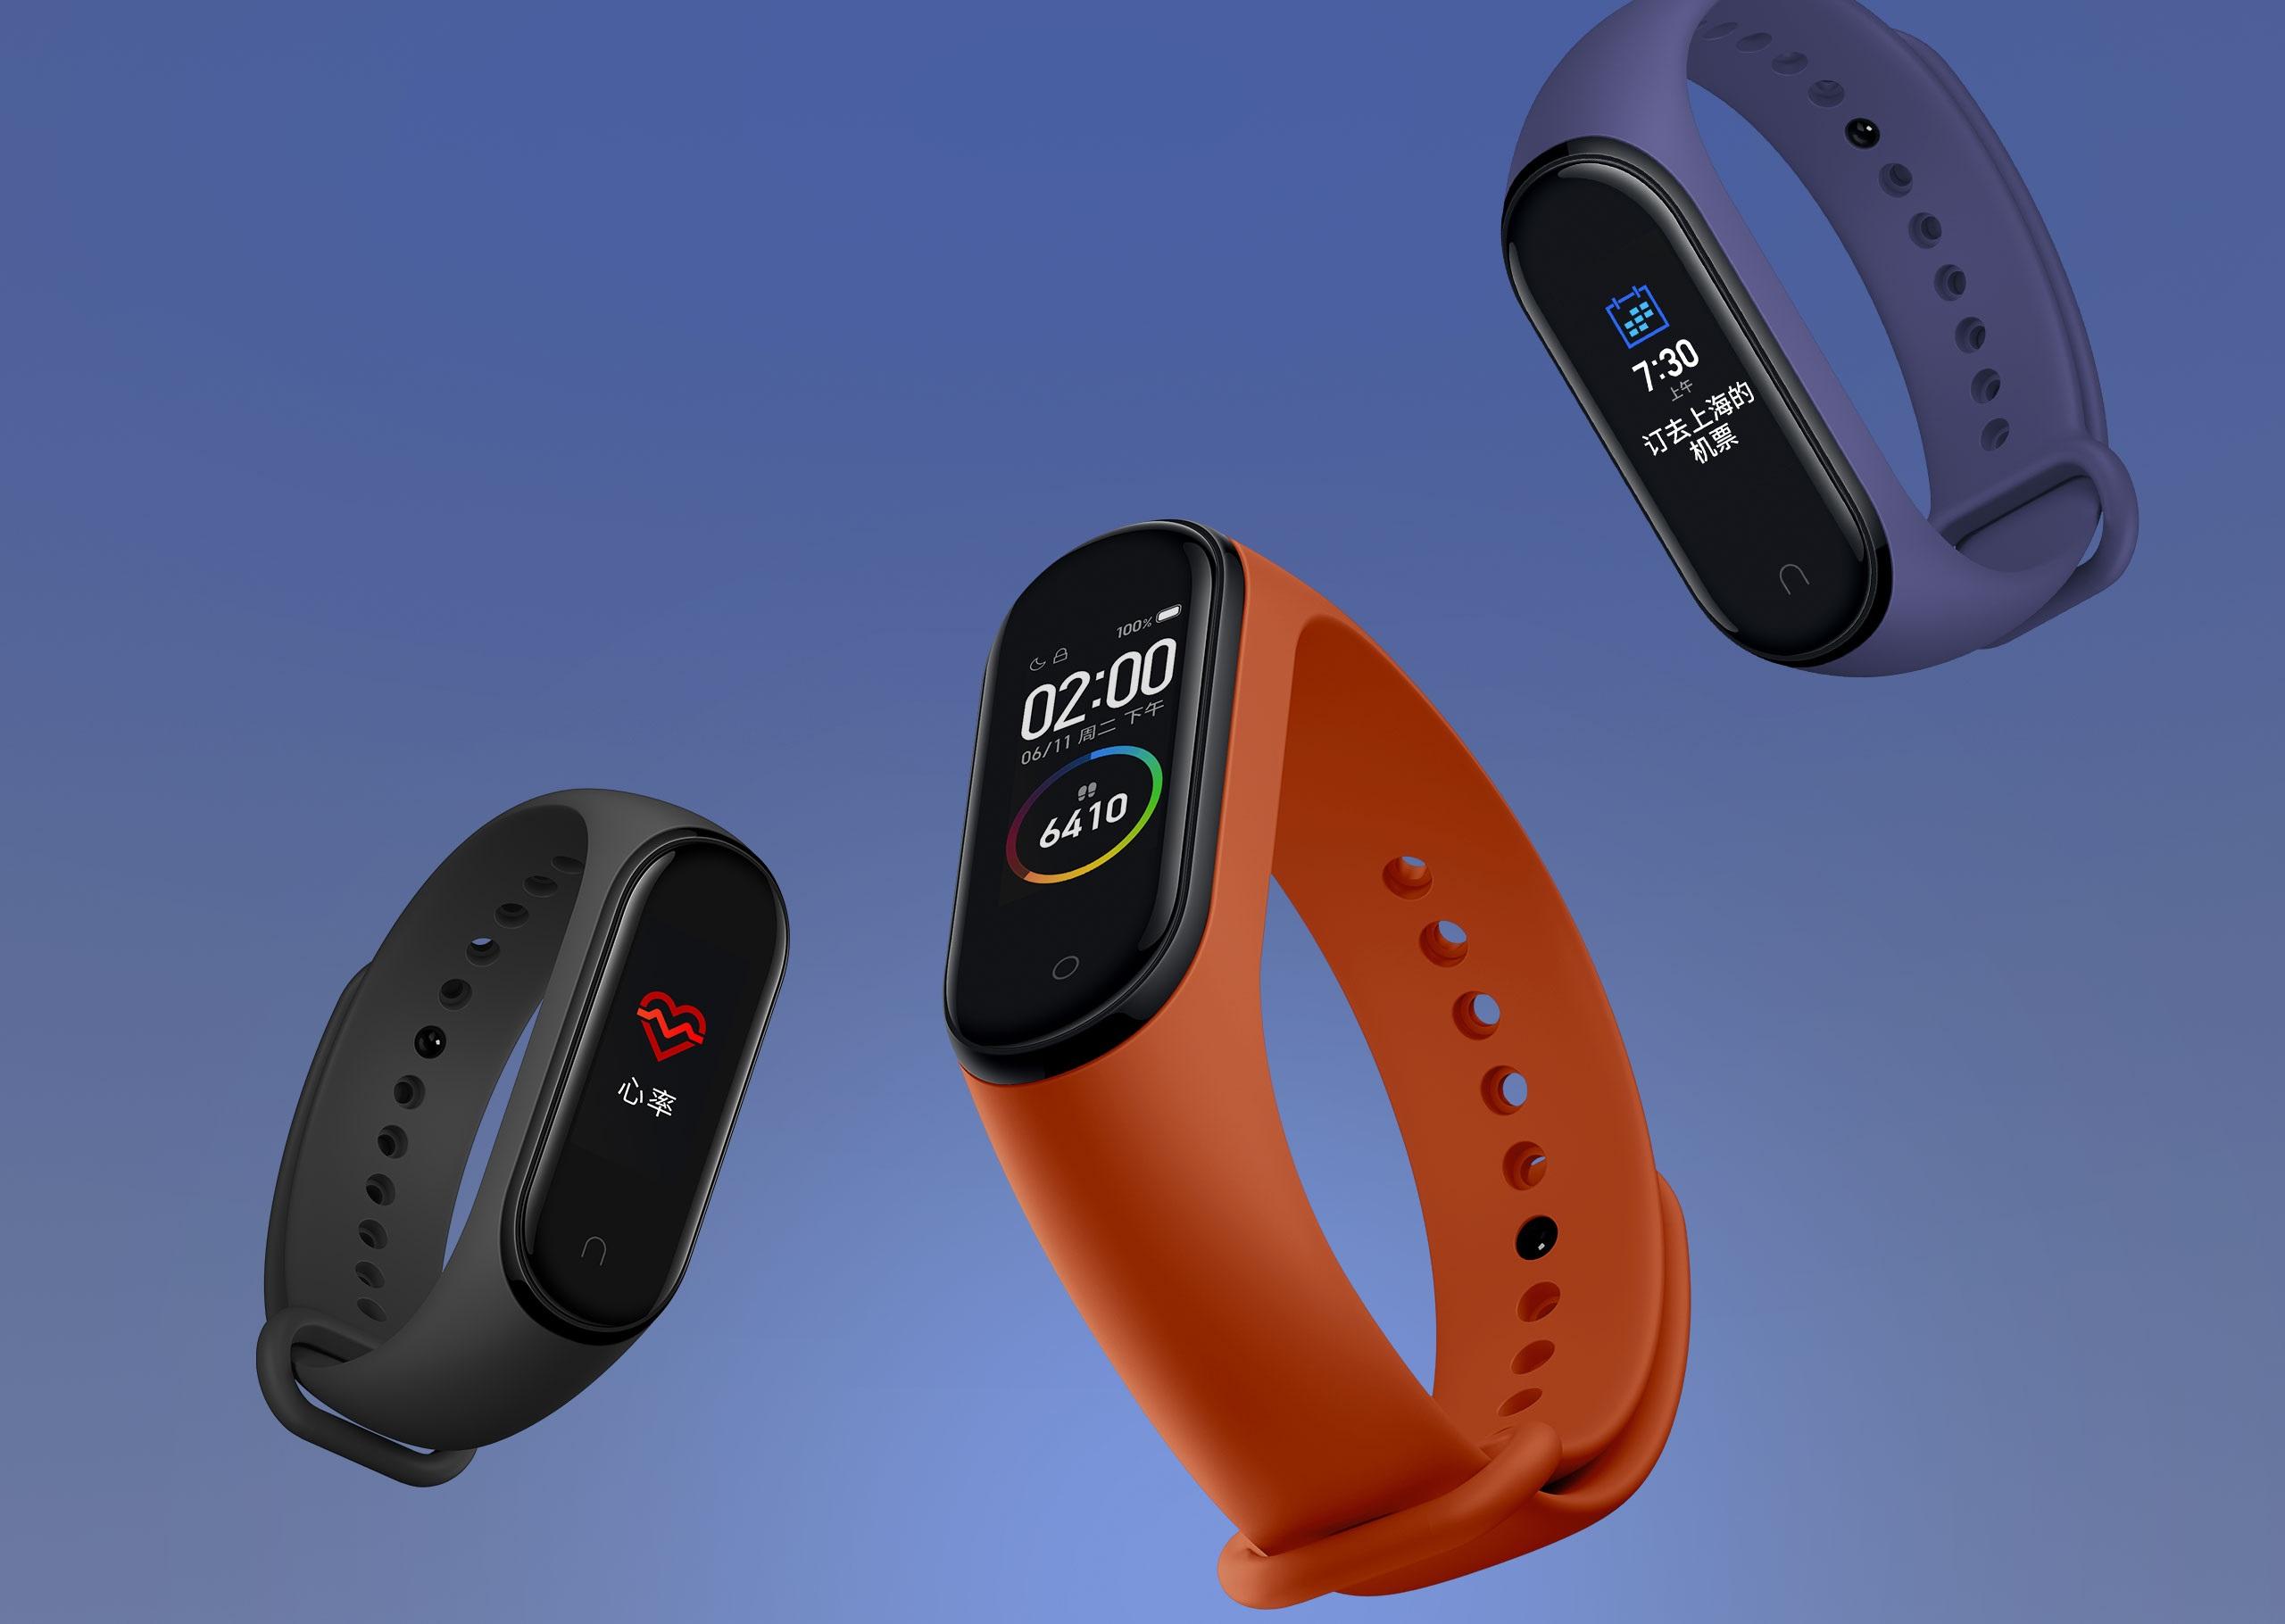 Xiaomi Mi Band 4 smart sport fitness band